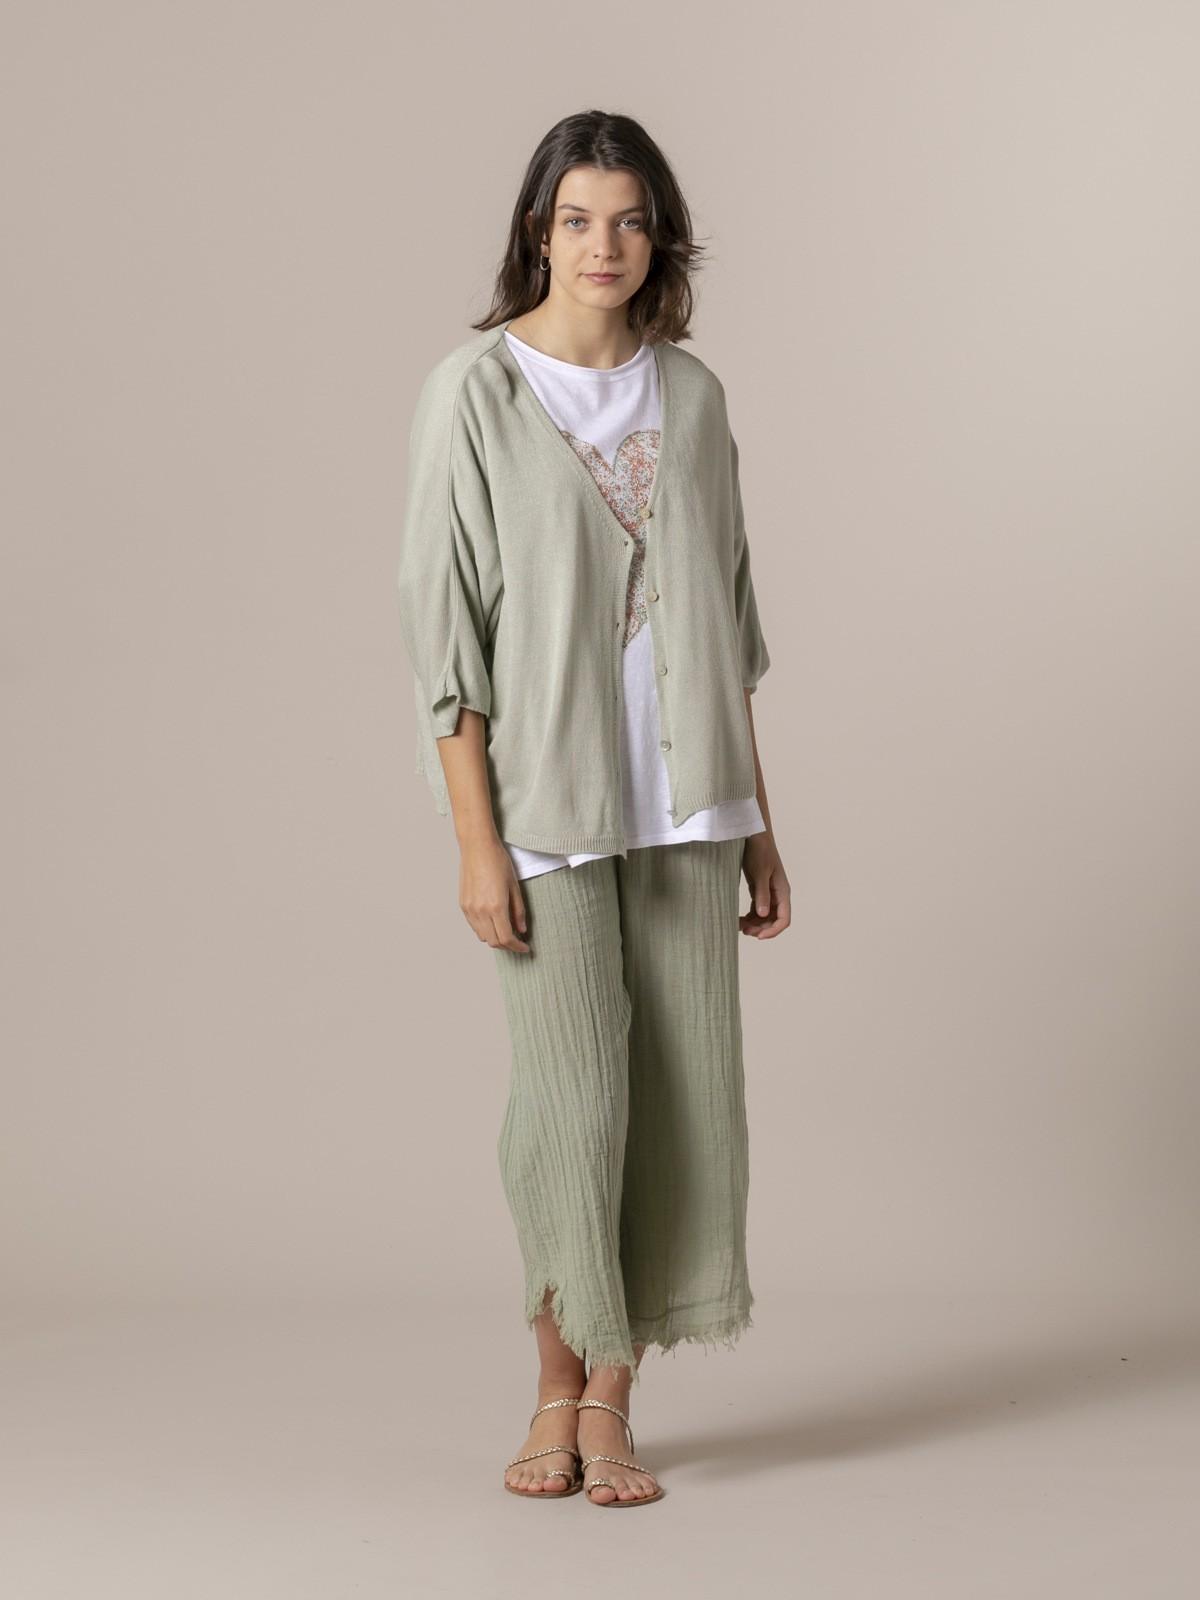 Chaqueta mujer modal manga corta Verde